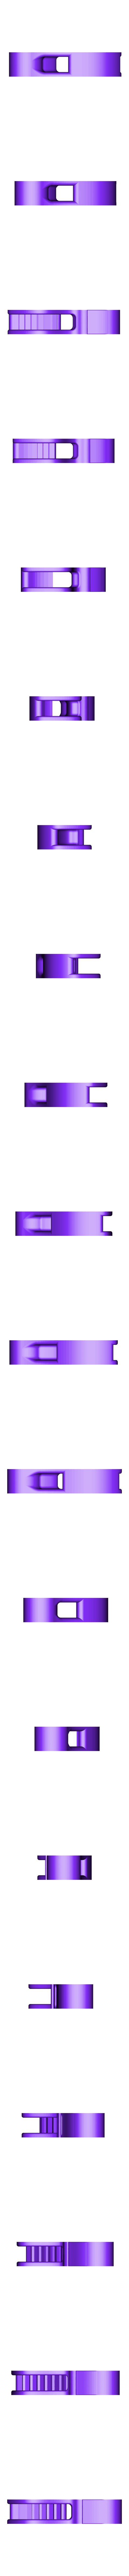 cam-base.stl Download free STL file Rope tensioner (cam) fully printed • 3D printing object, dvilleneuve